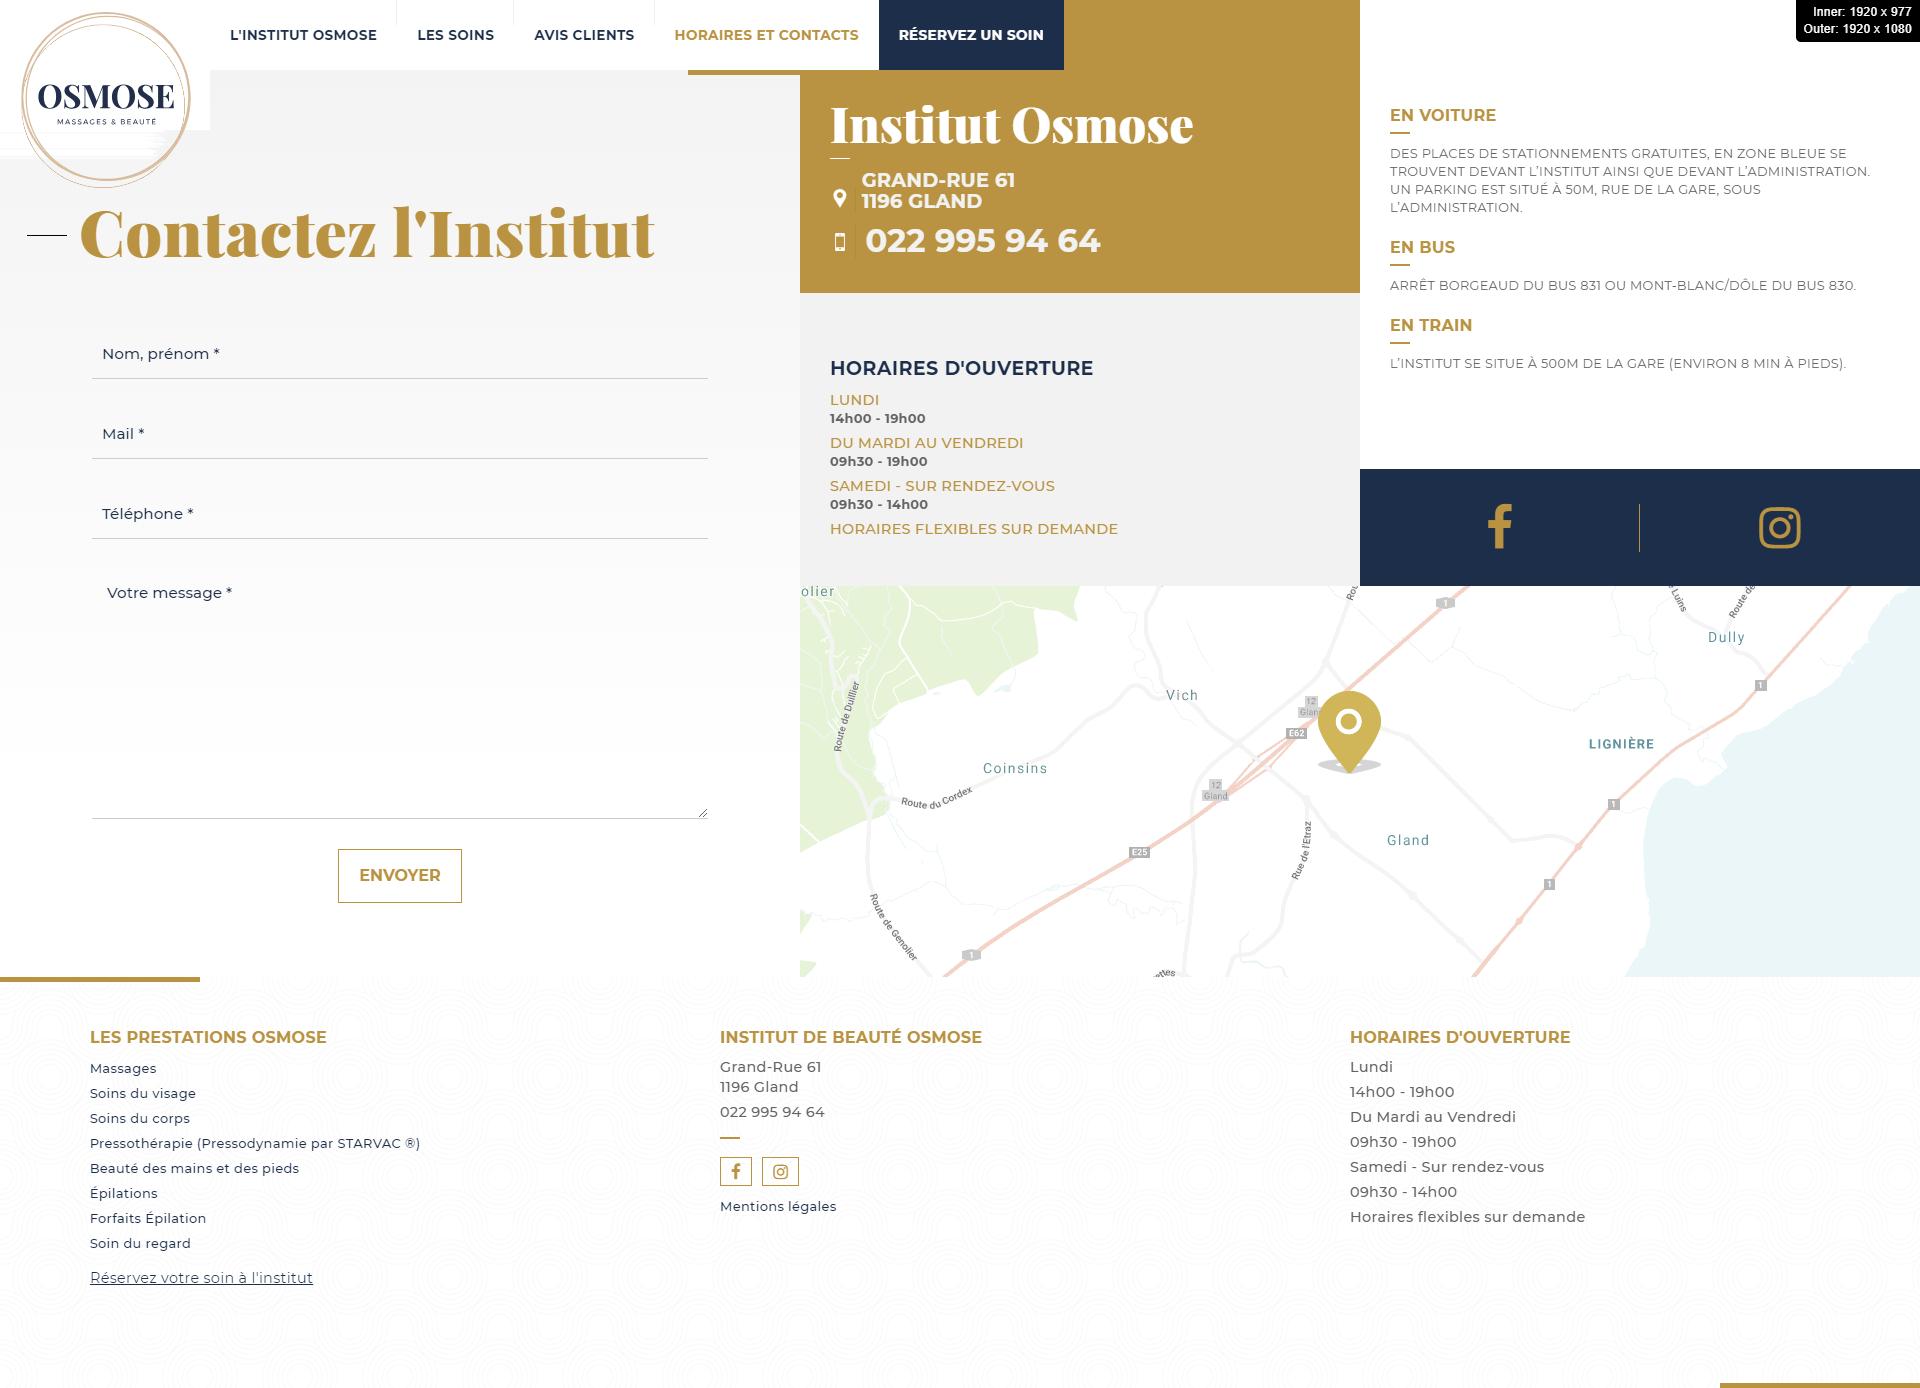 institut osmose beaute kalfeutre webdesigner lyon